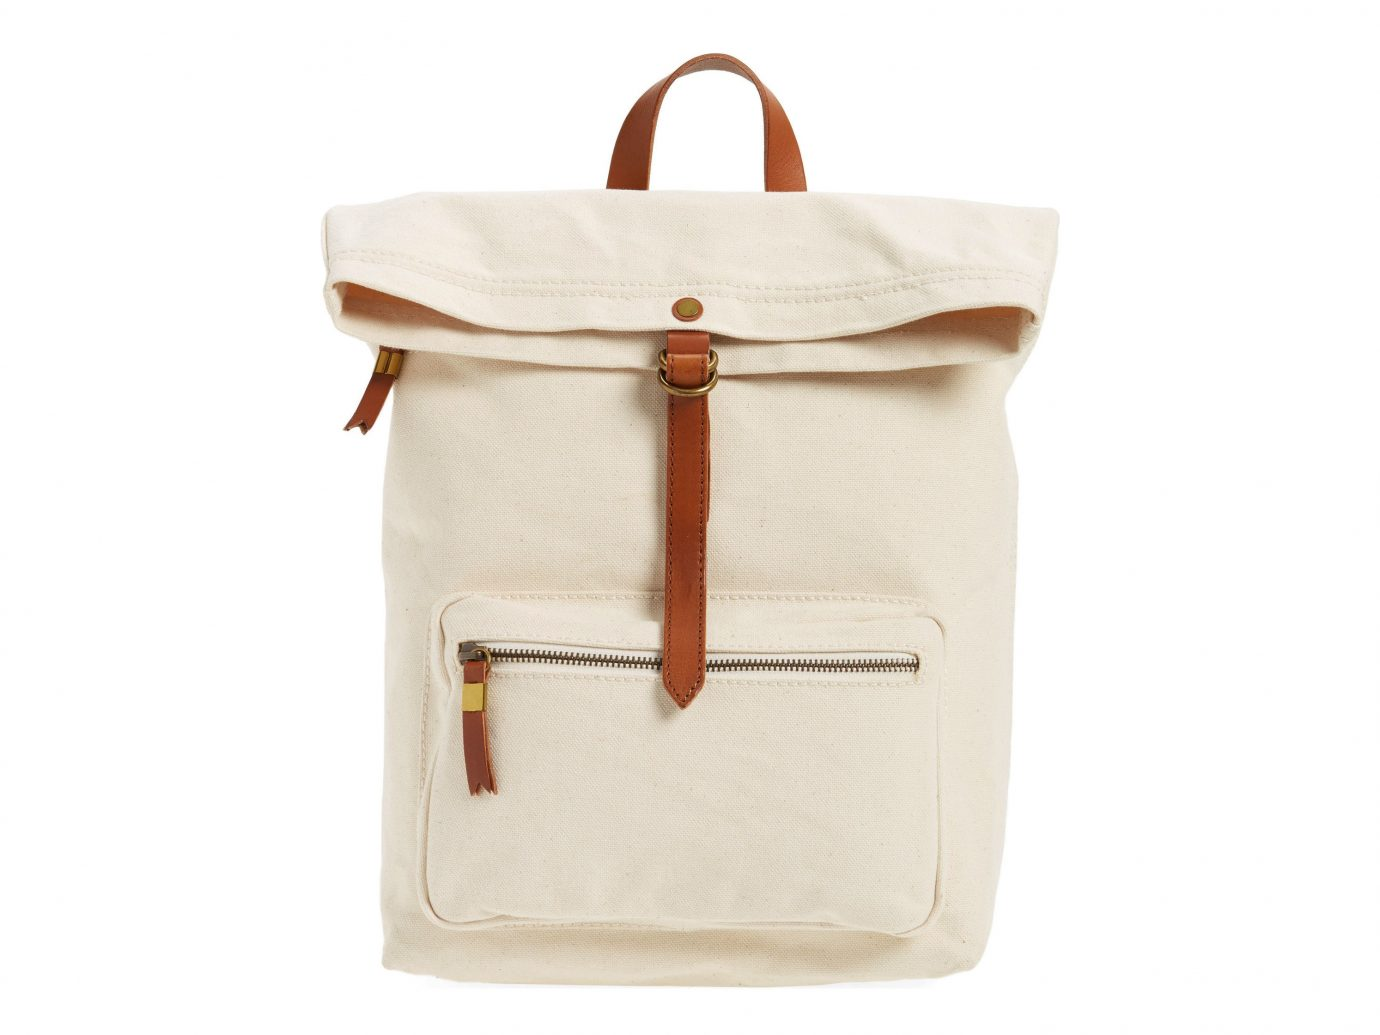 Morocco Packing Tips Style + Design Travel Shop white bag product beige shoulder bag product design